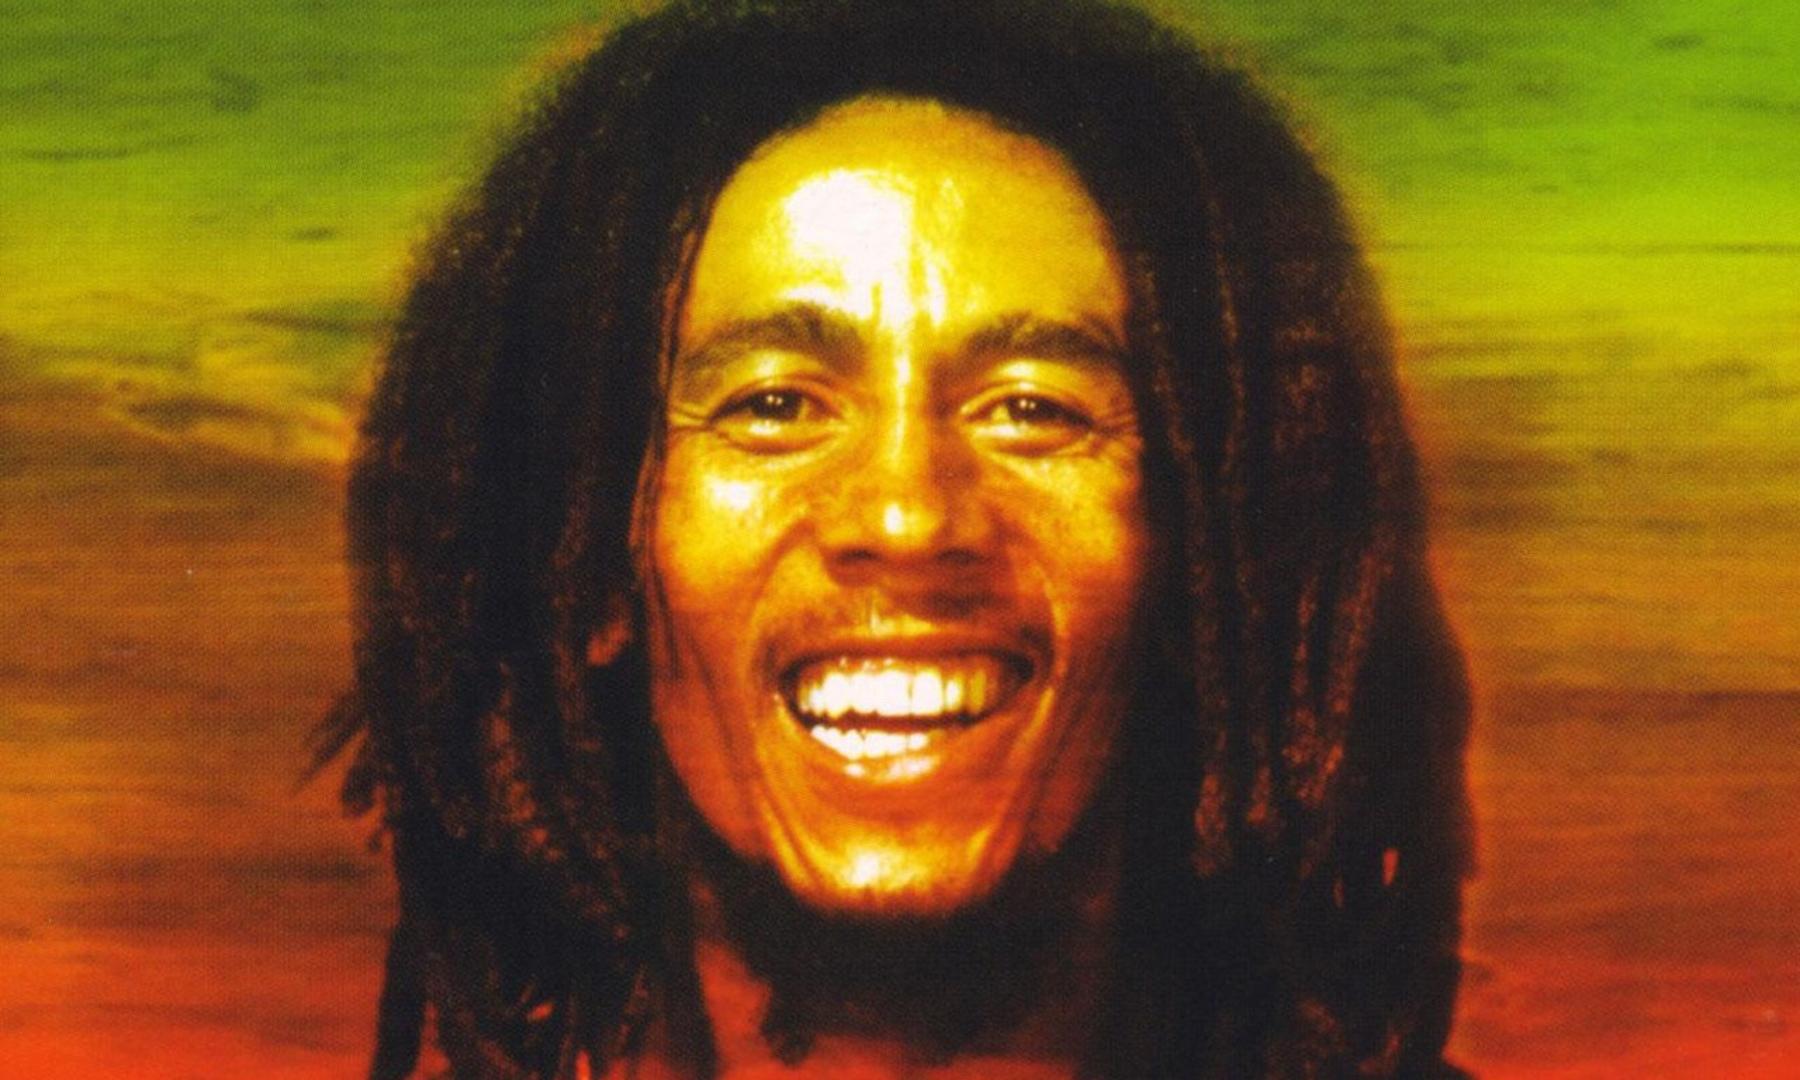 Bob Marley: The Time Bob Marley Was Protected By Rasta Ninjas